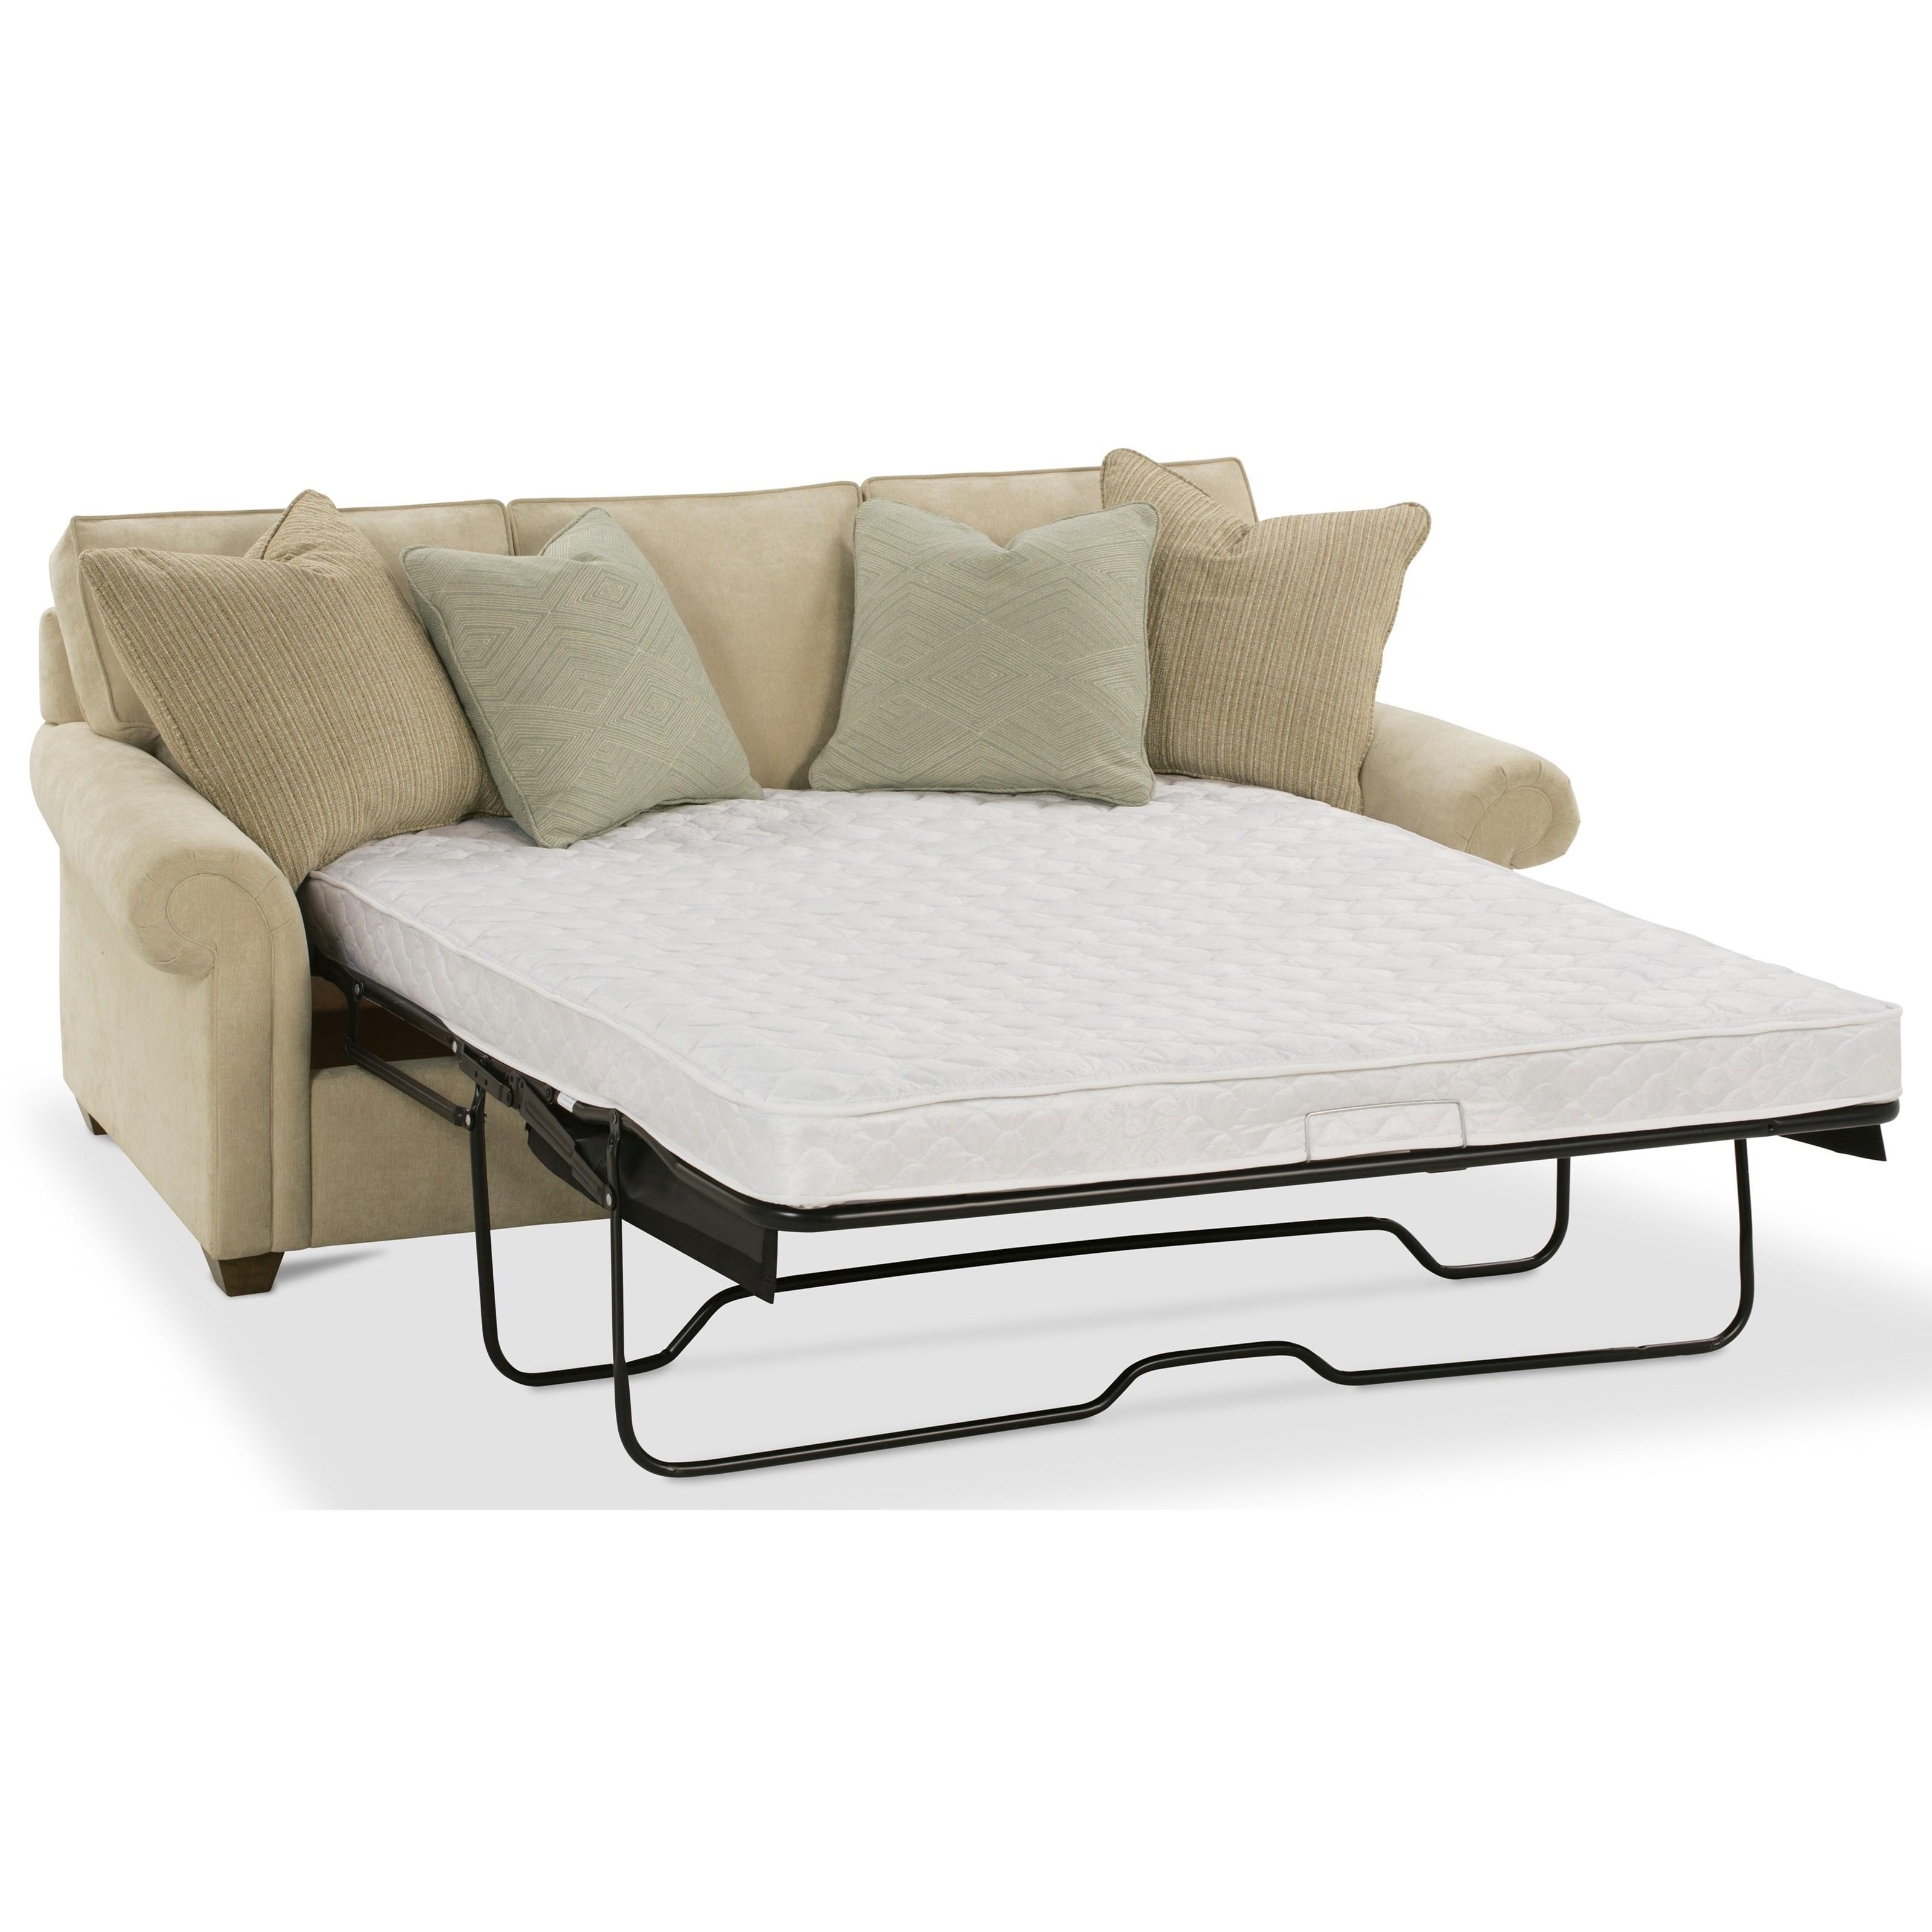 Rowe Morgan Traditional Queen Sleeper Sofa Sprintz